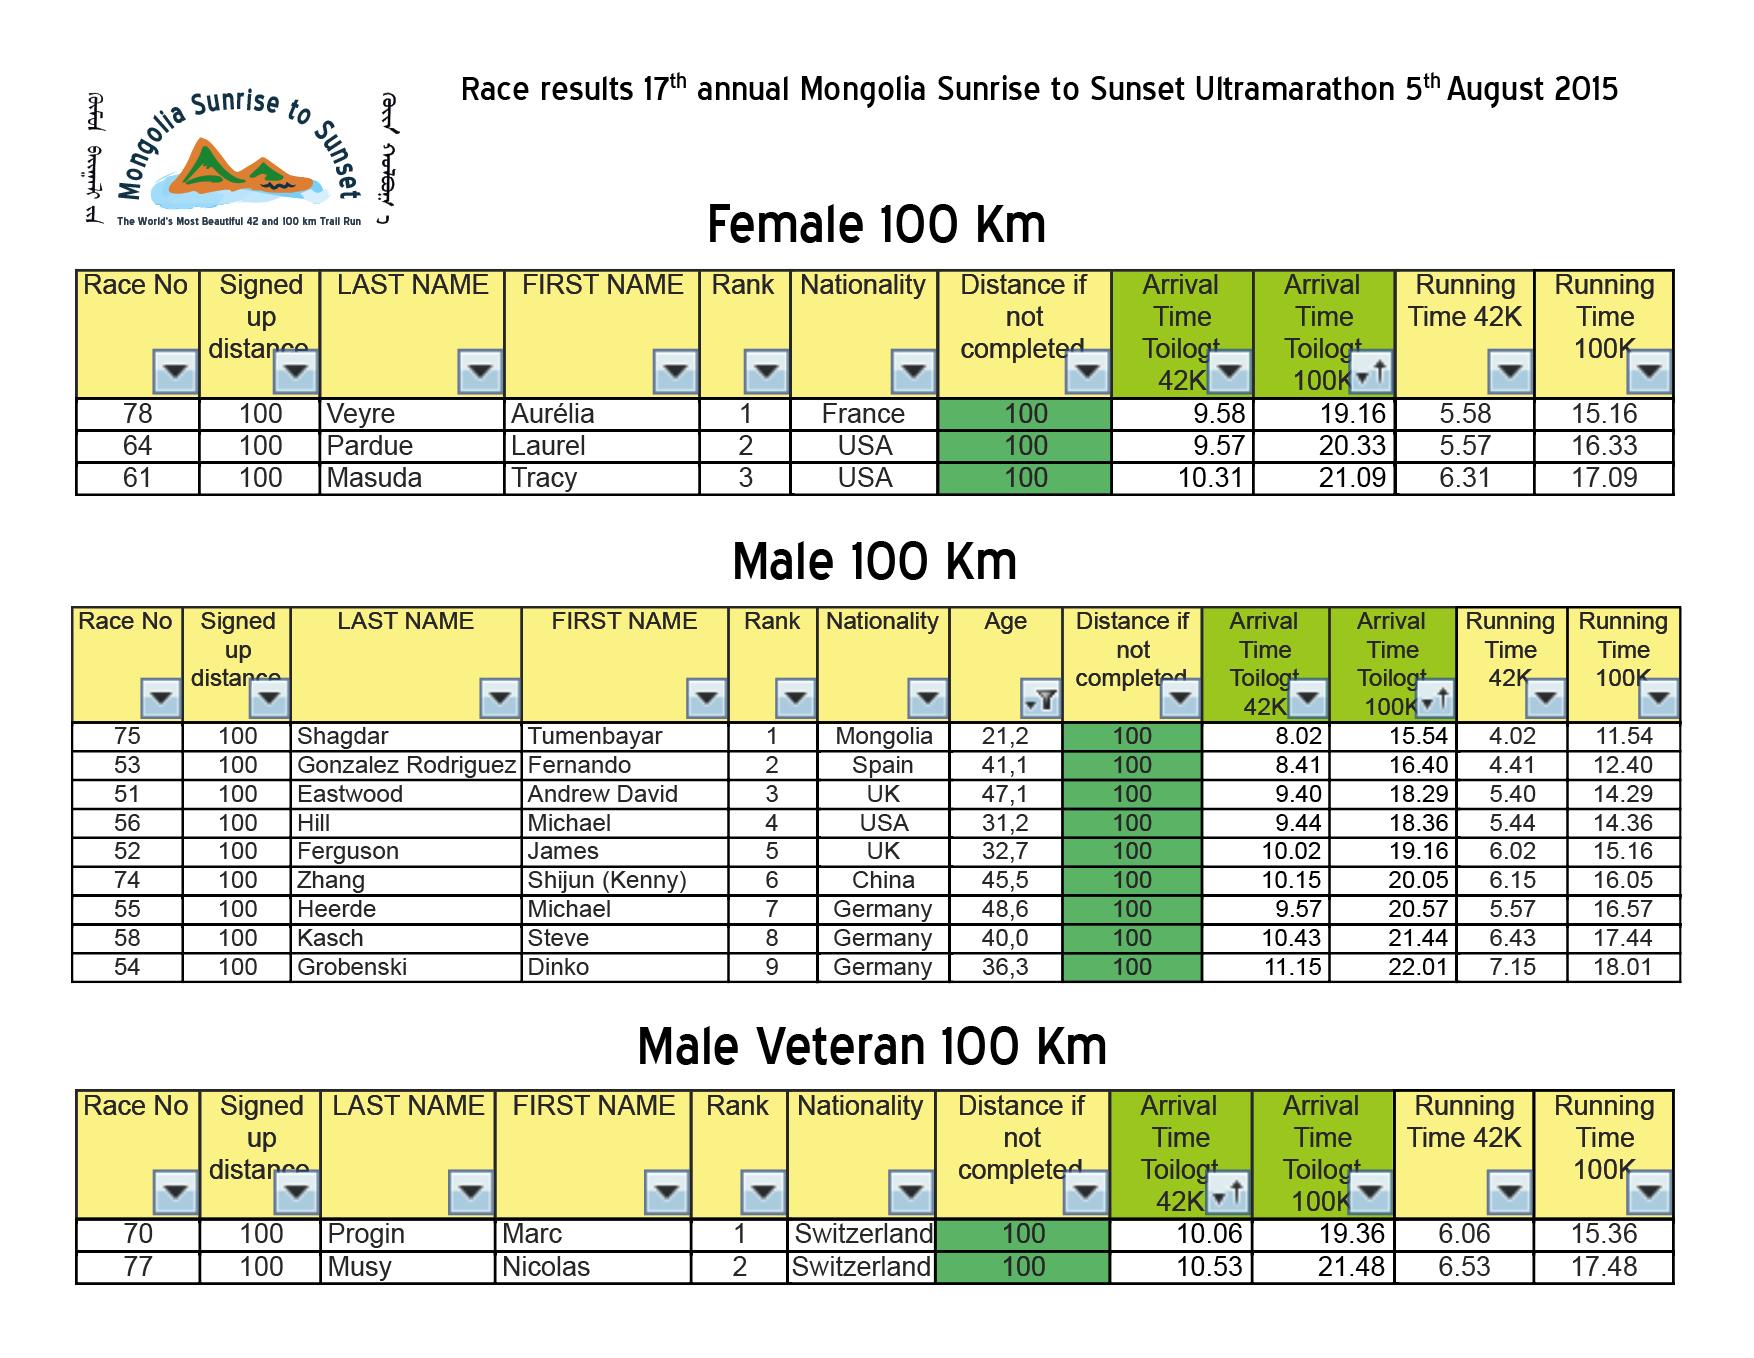 Race results 17th annual Mongolia Sunrise to Sunset 2015 Ultramarathon3